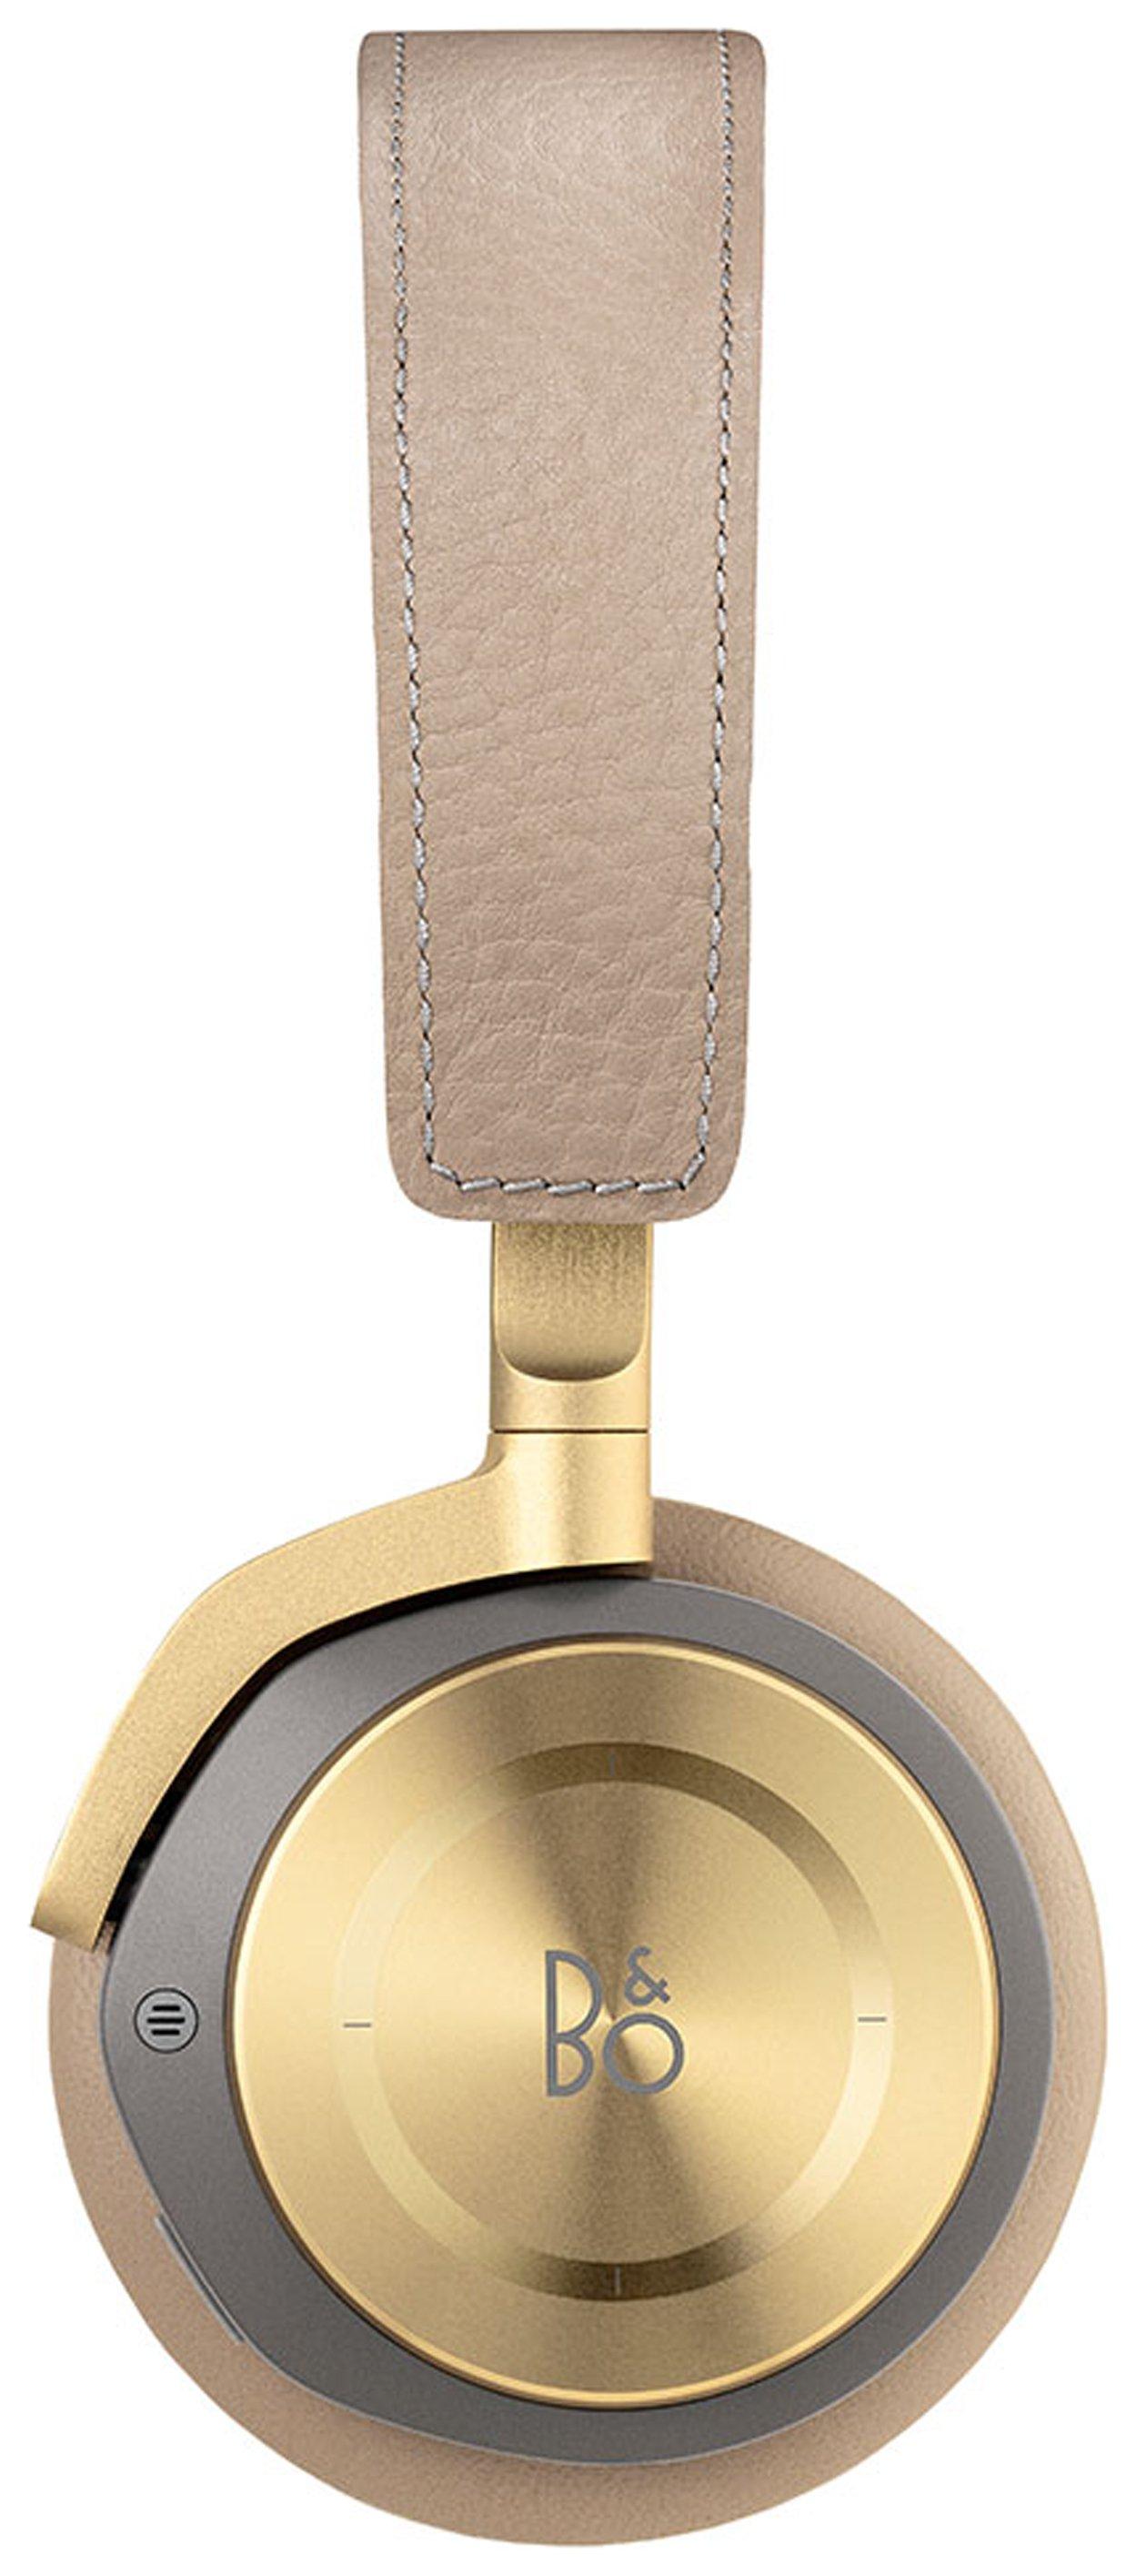 Image of B&O PLAY by Bang & Olufsen H8 Wireless Headphones - Argilla.